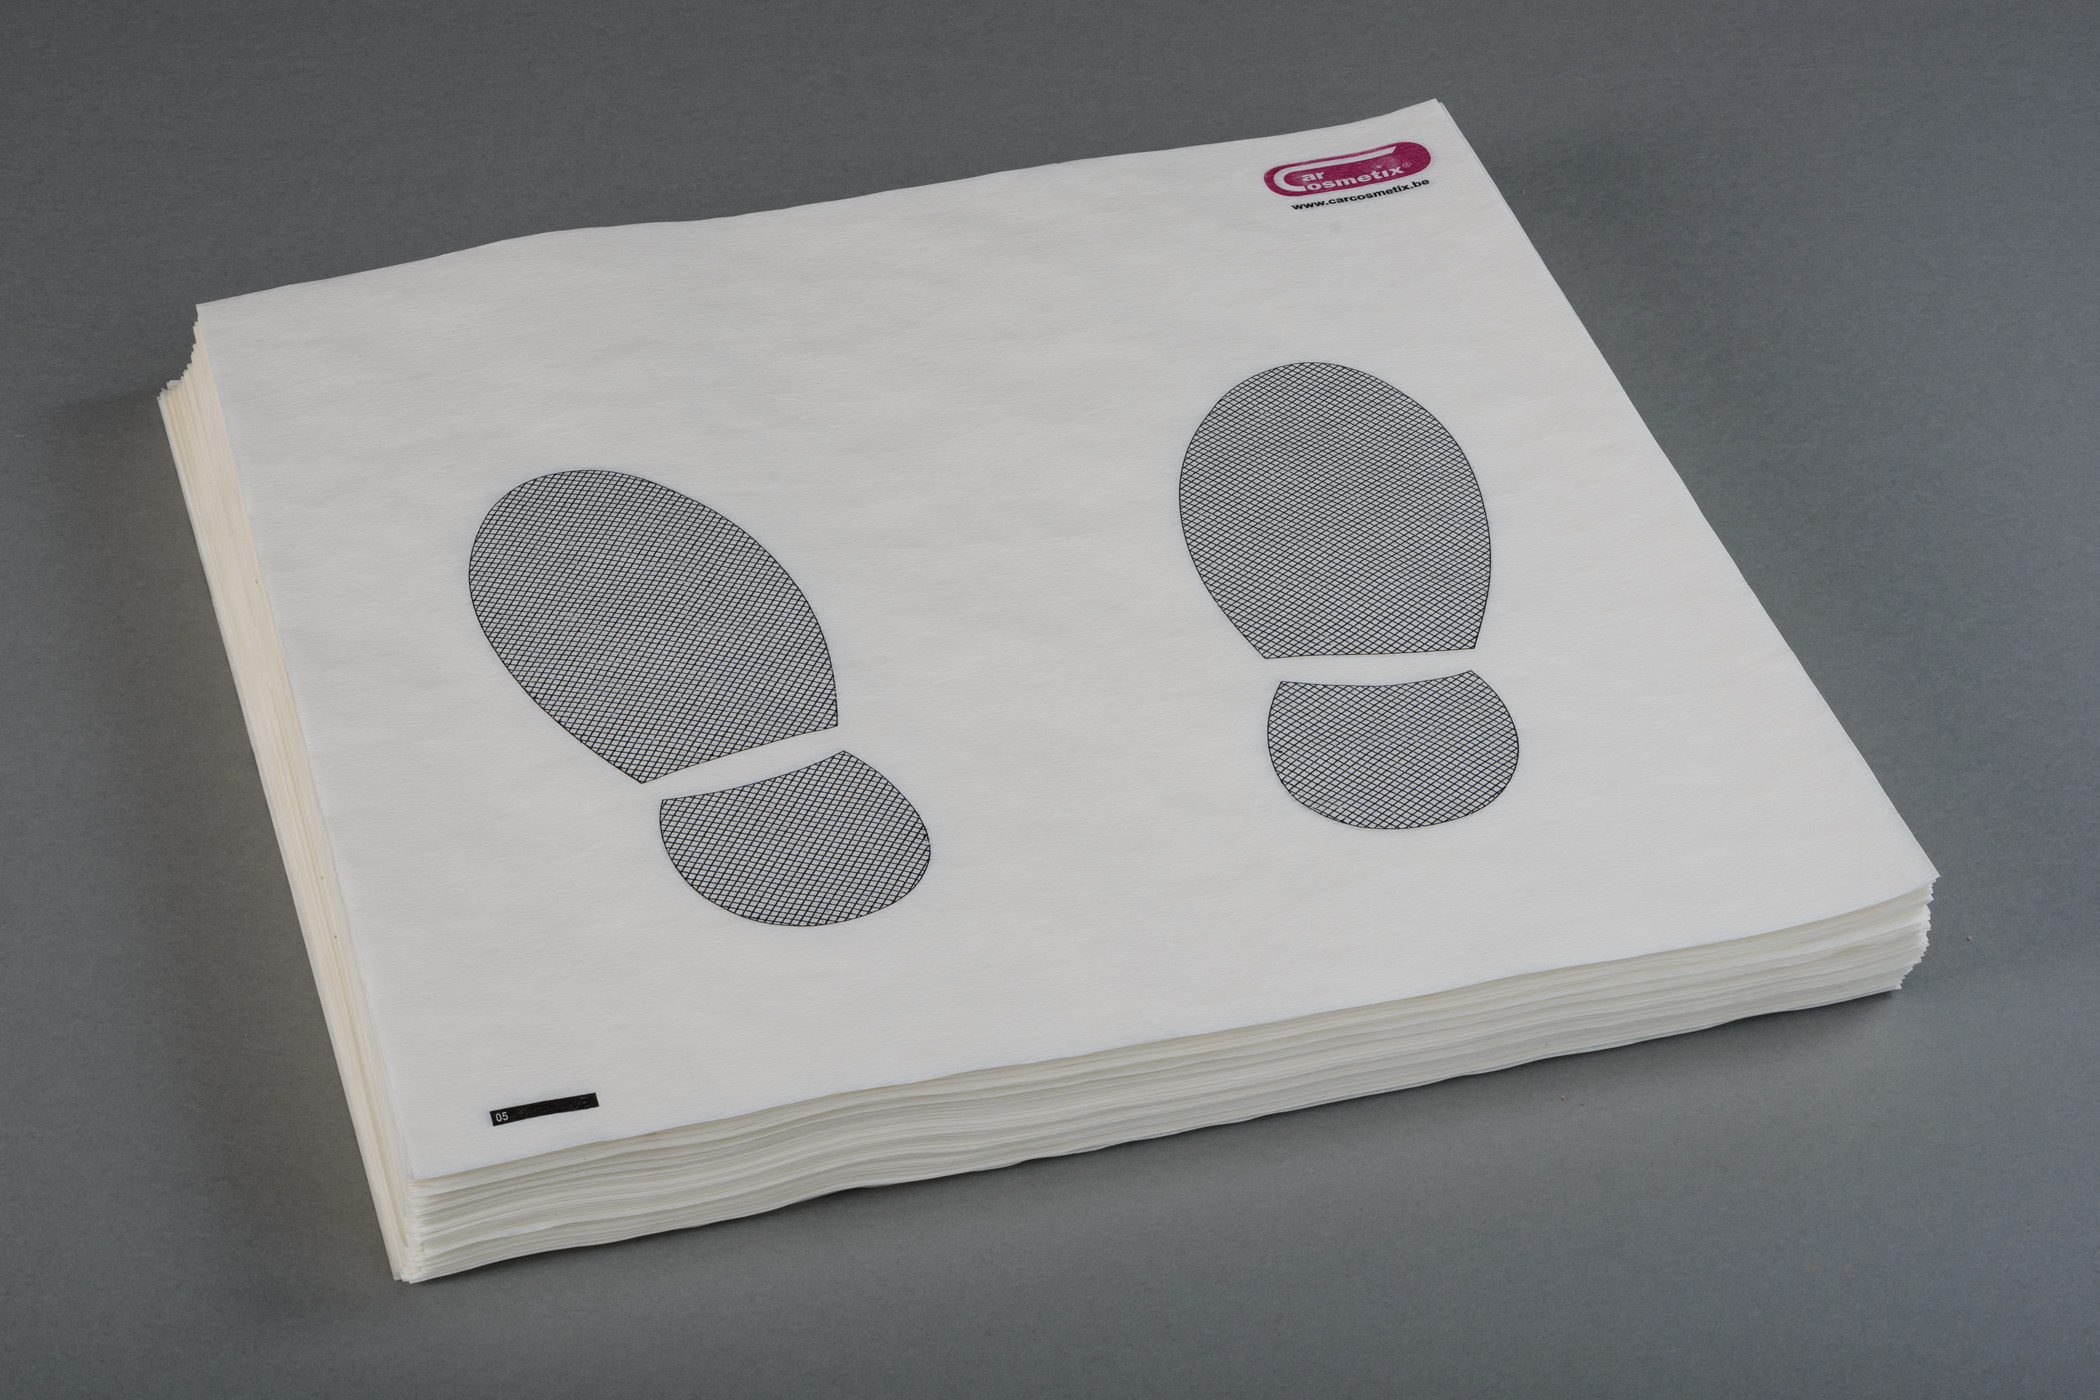 CARCOSMETIX FLOORMATS 250PCS - NL Doos met 250stuks kwalitatieve Carcosmetix vloermatten.FR Carton a 250 tapis de sol en papier Carcosmetix.EN Carton with 250 floormats Carcosmetix.